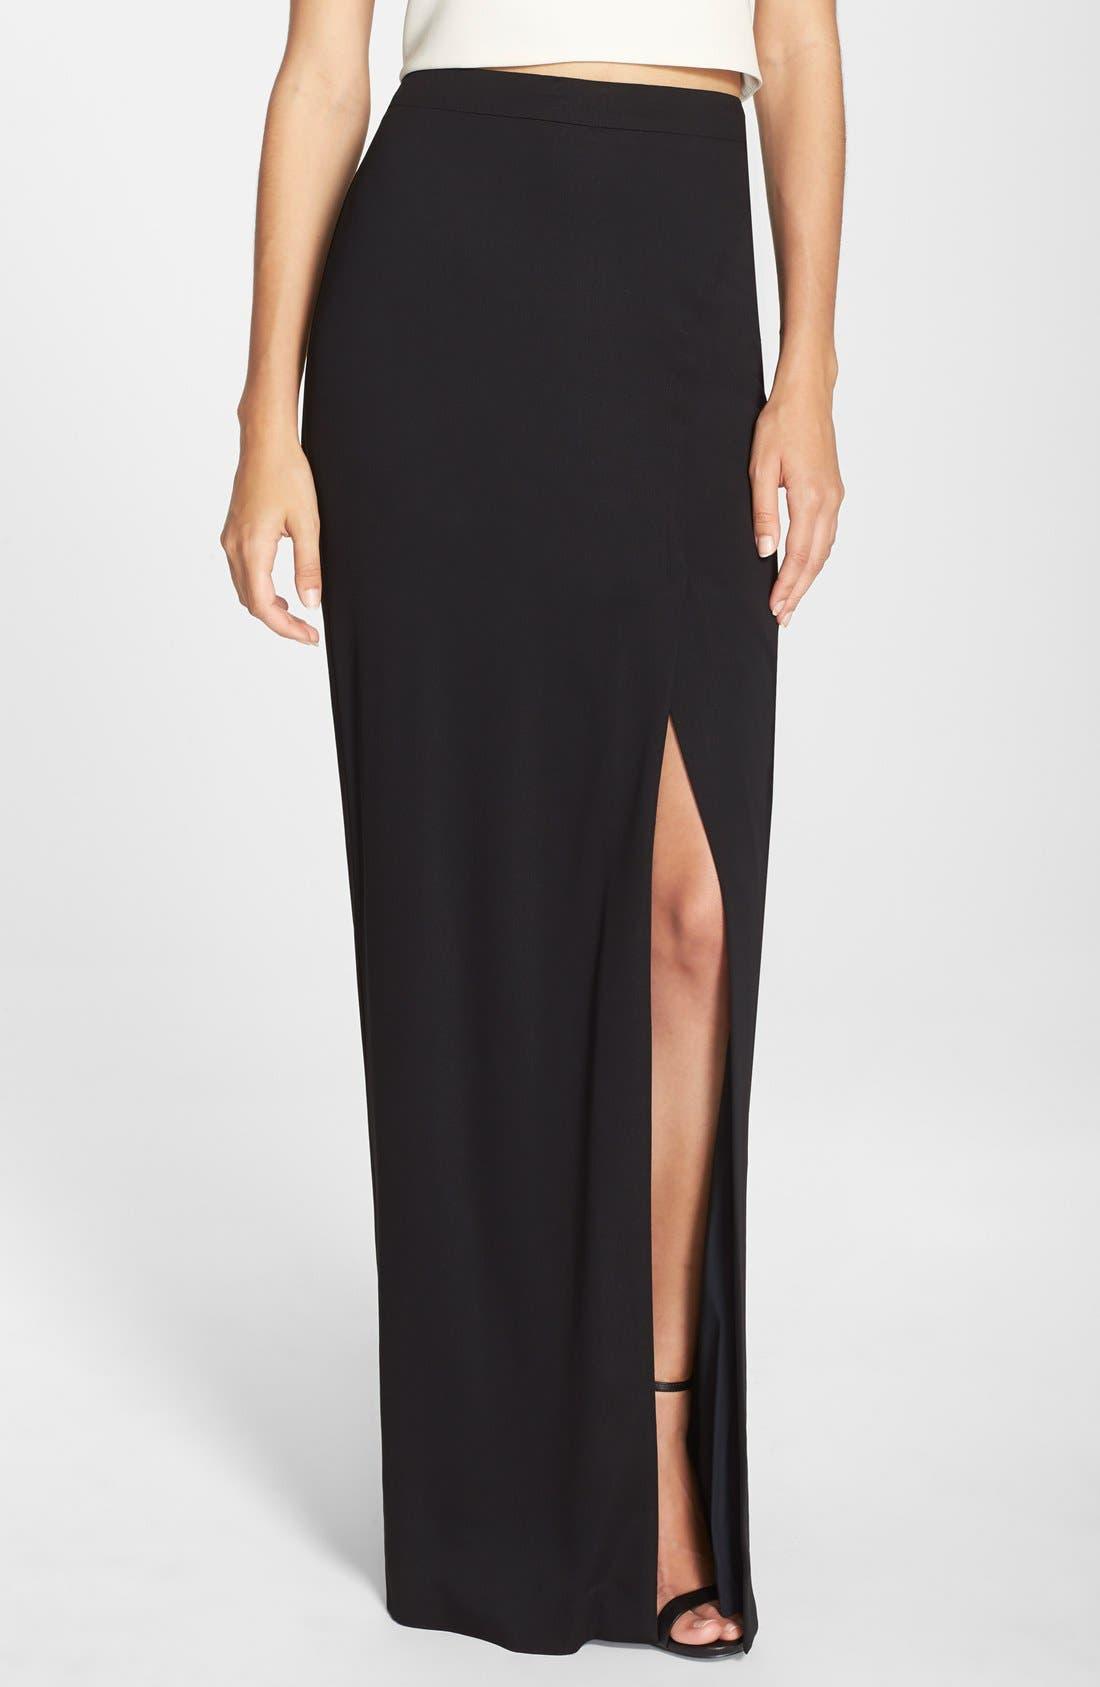 Alternate Image 1 Selected - Nicole Miller Front Slit Stretch Crepe Maxi Skirt